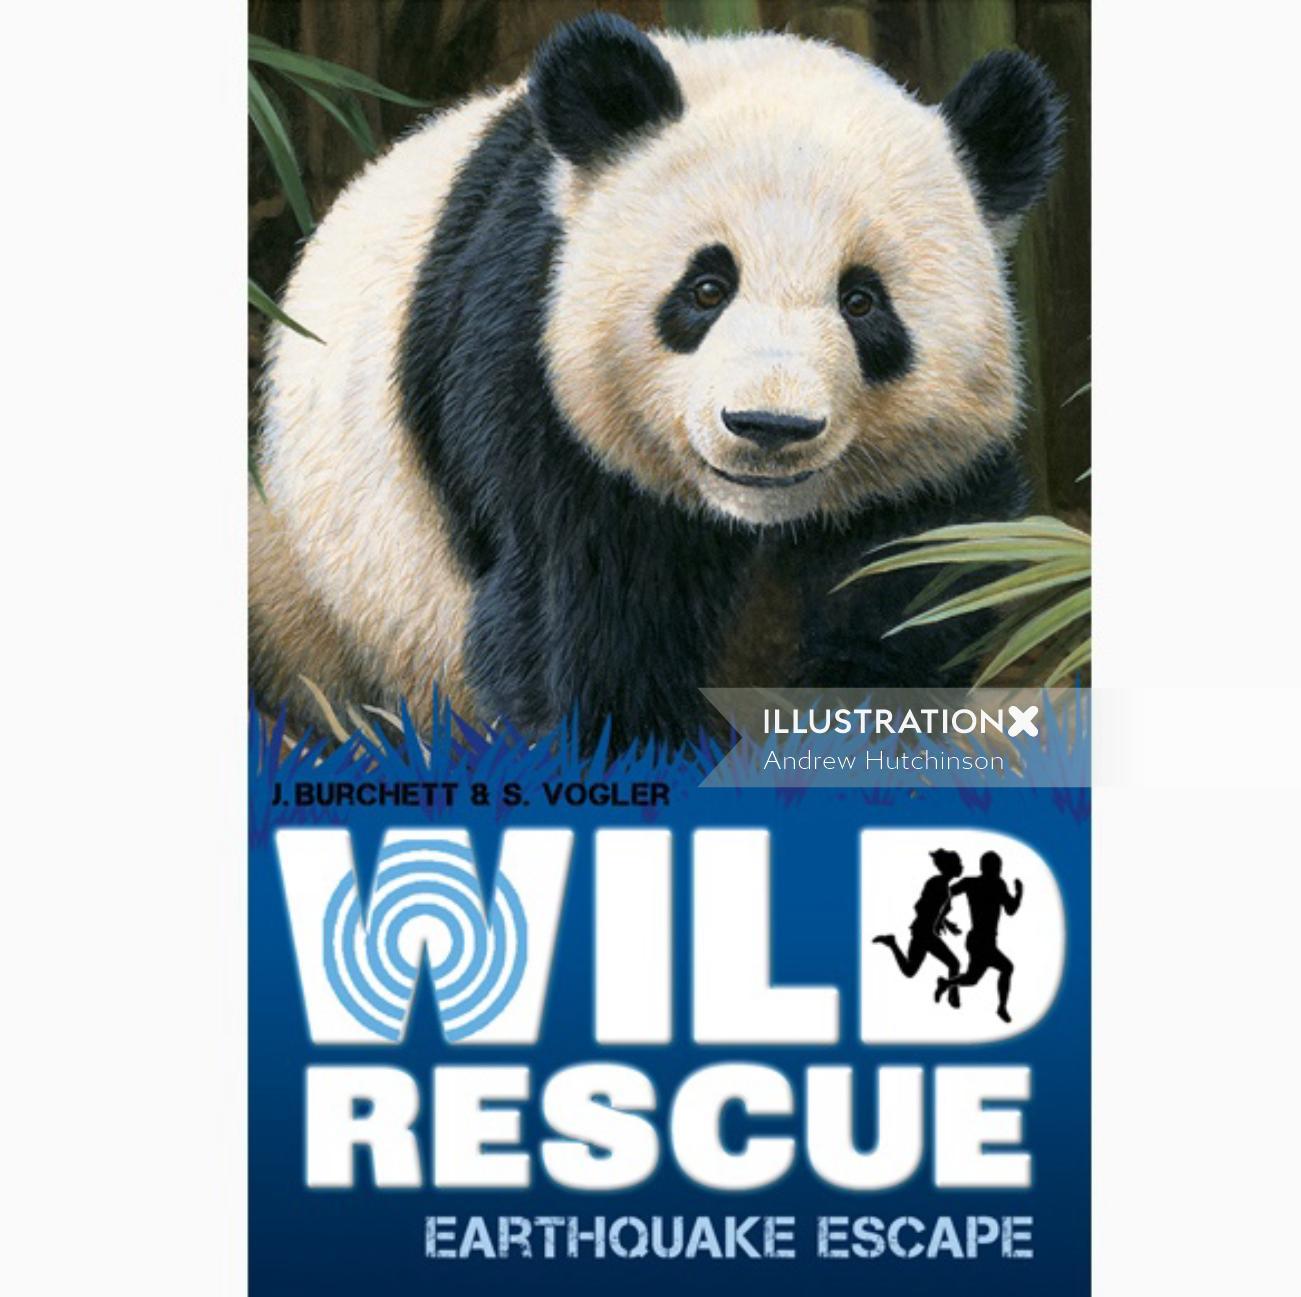 Panda Cub Illustration, Wildlife Images © Andrew Hutchinson